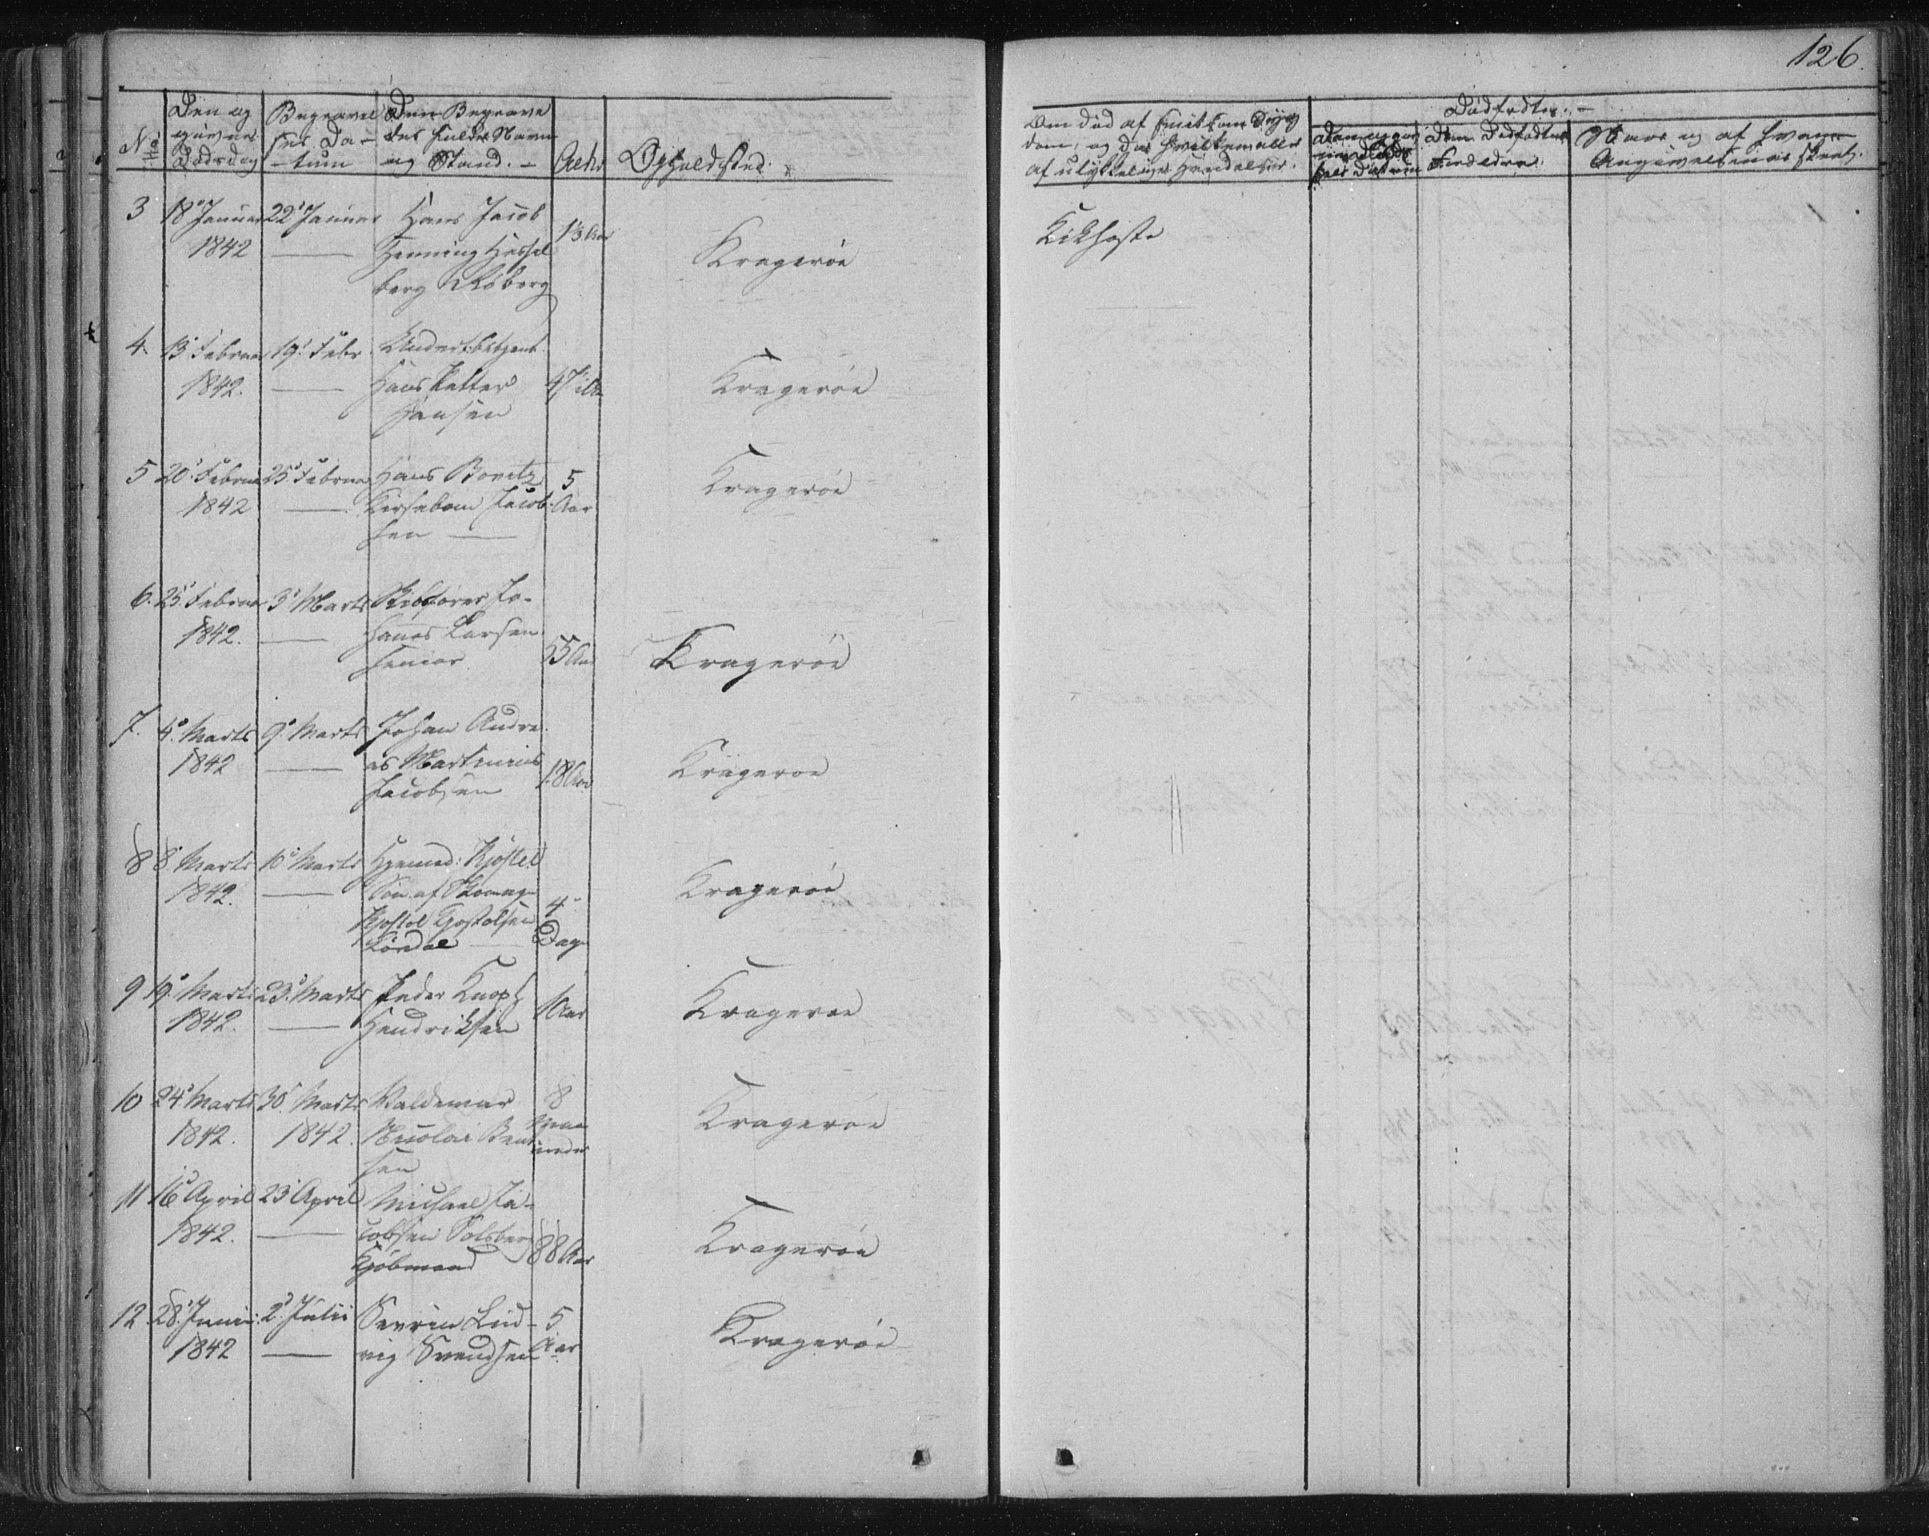 SAKO, Kragerø kirkebøker, F/Fa/L0005: Ministerialbok nr. 5, 1832-1847, s. 126